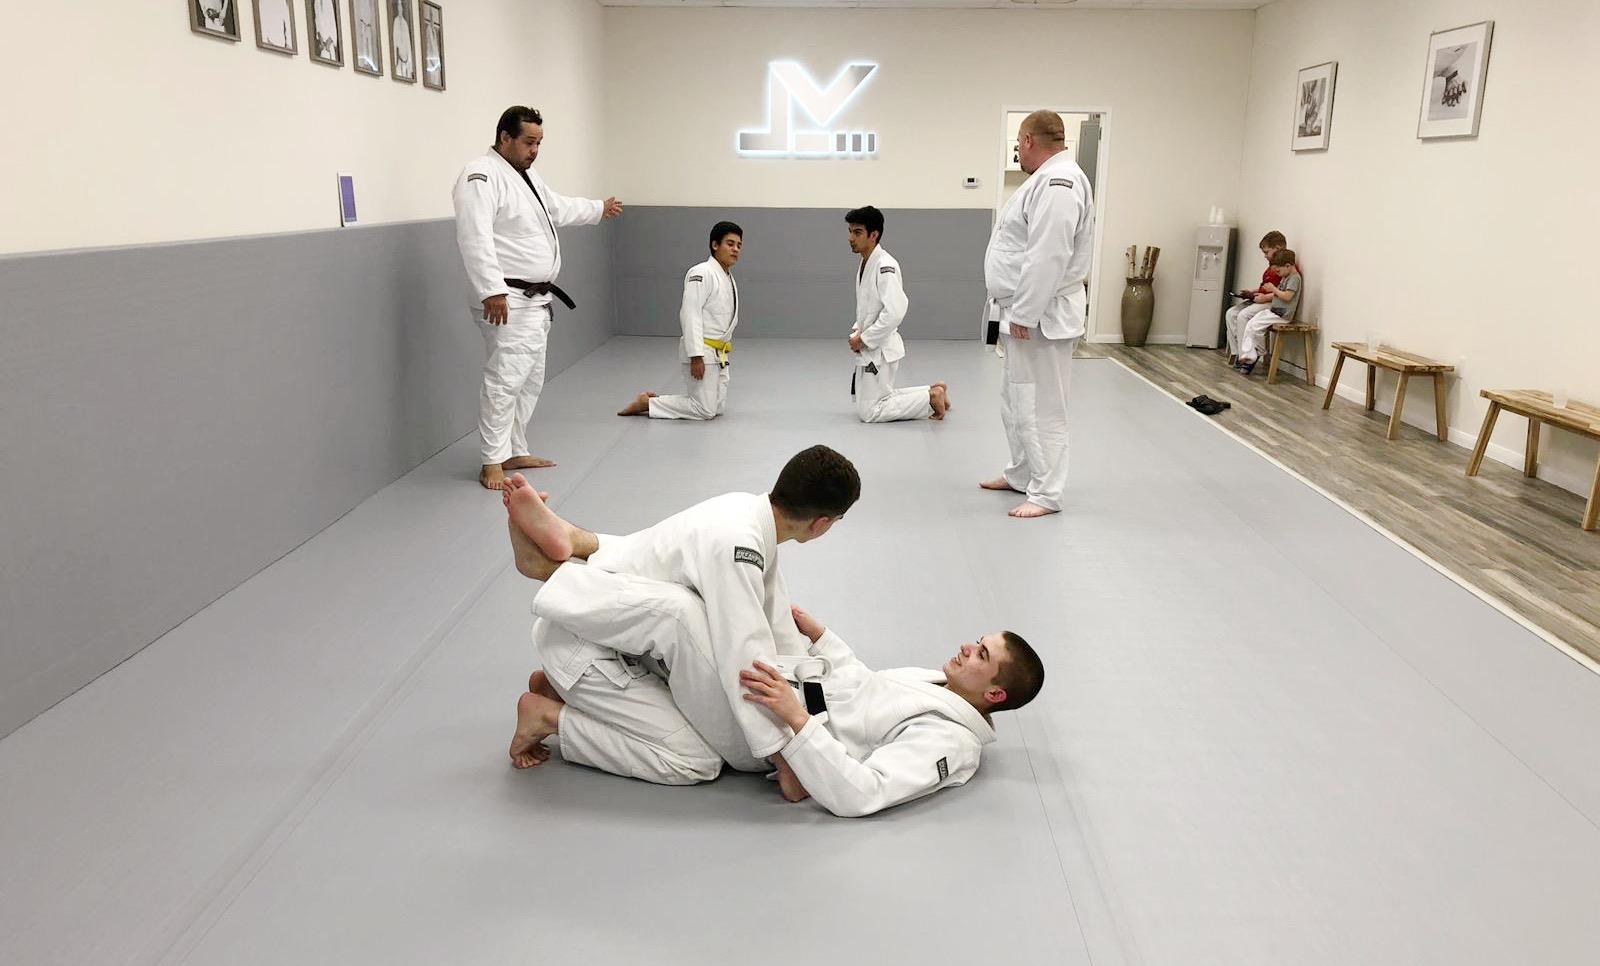 beginner jiu jitsu classes in cypress texas.jpg